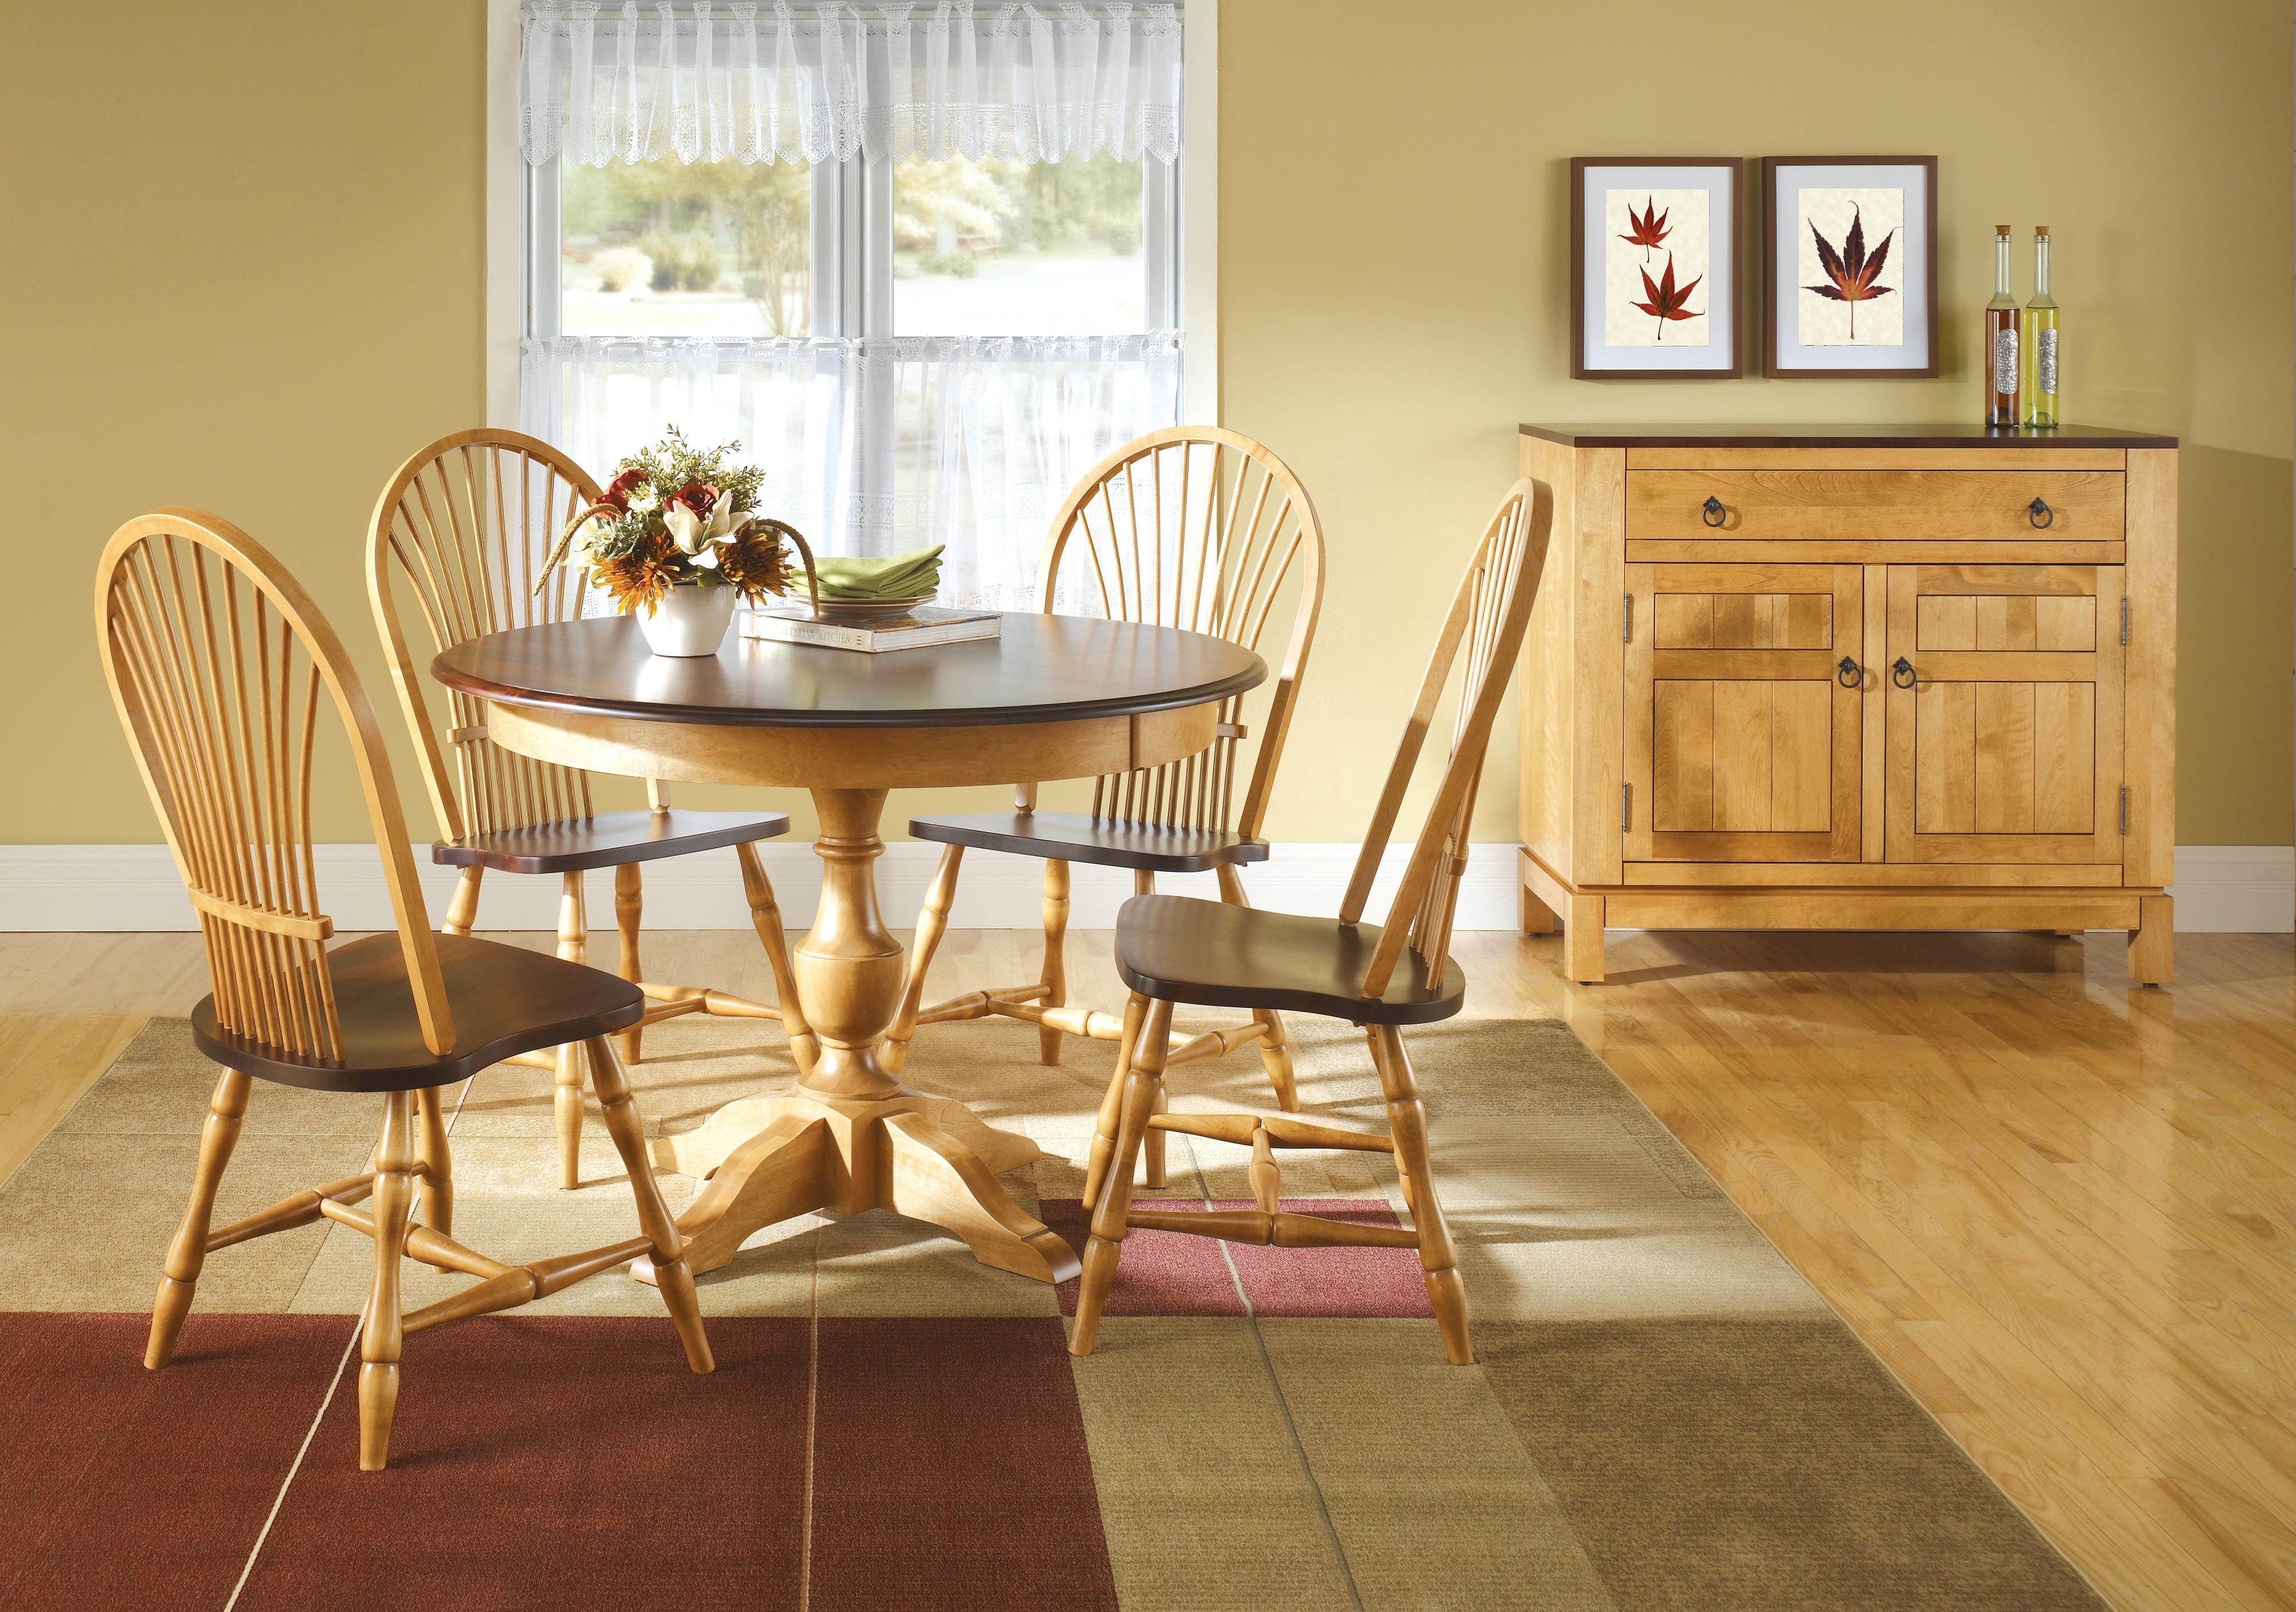 canadel custom dining casual dining room group john v schultz furniture casual dining room. Black Bedroom Furniture Sets. Home Design Ideas